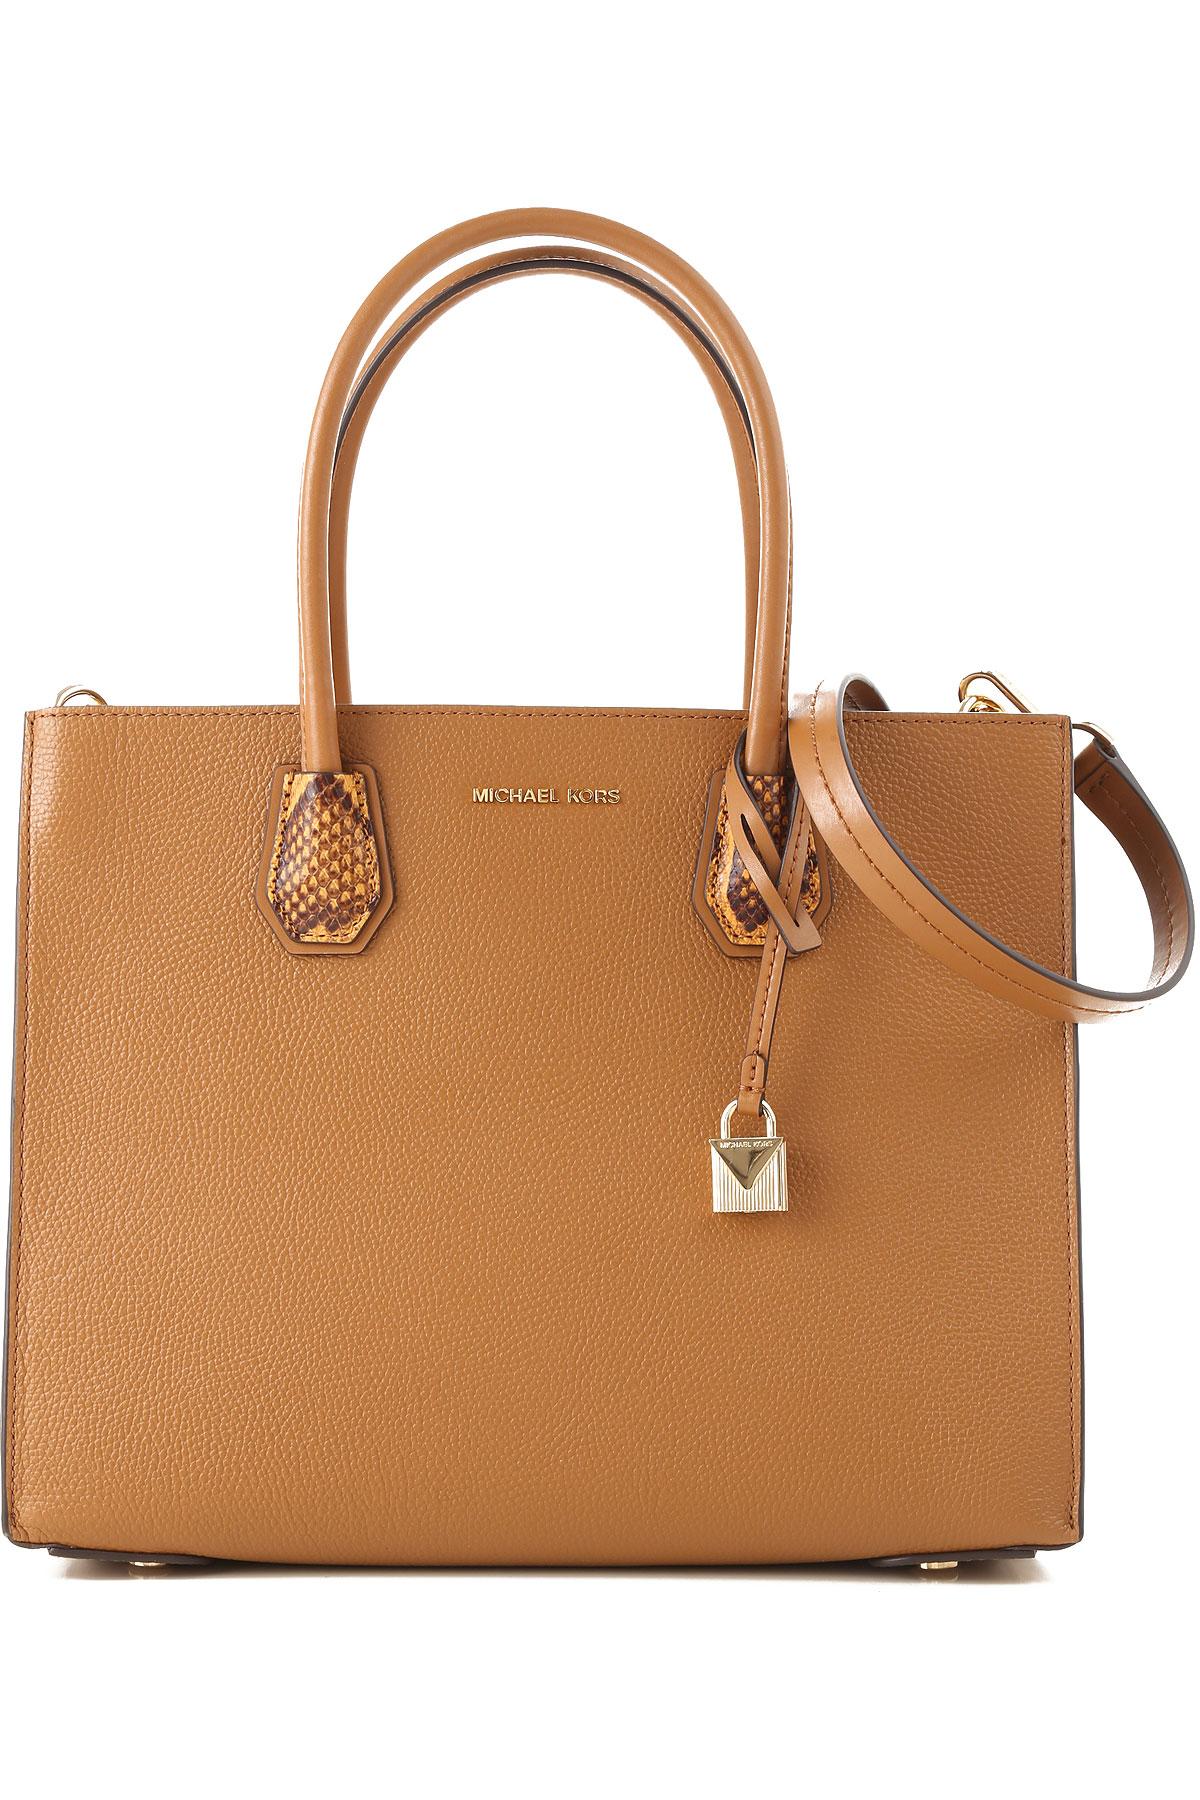 Michael Kors Top Handle Handbag, Acorn, Leather, 2019